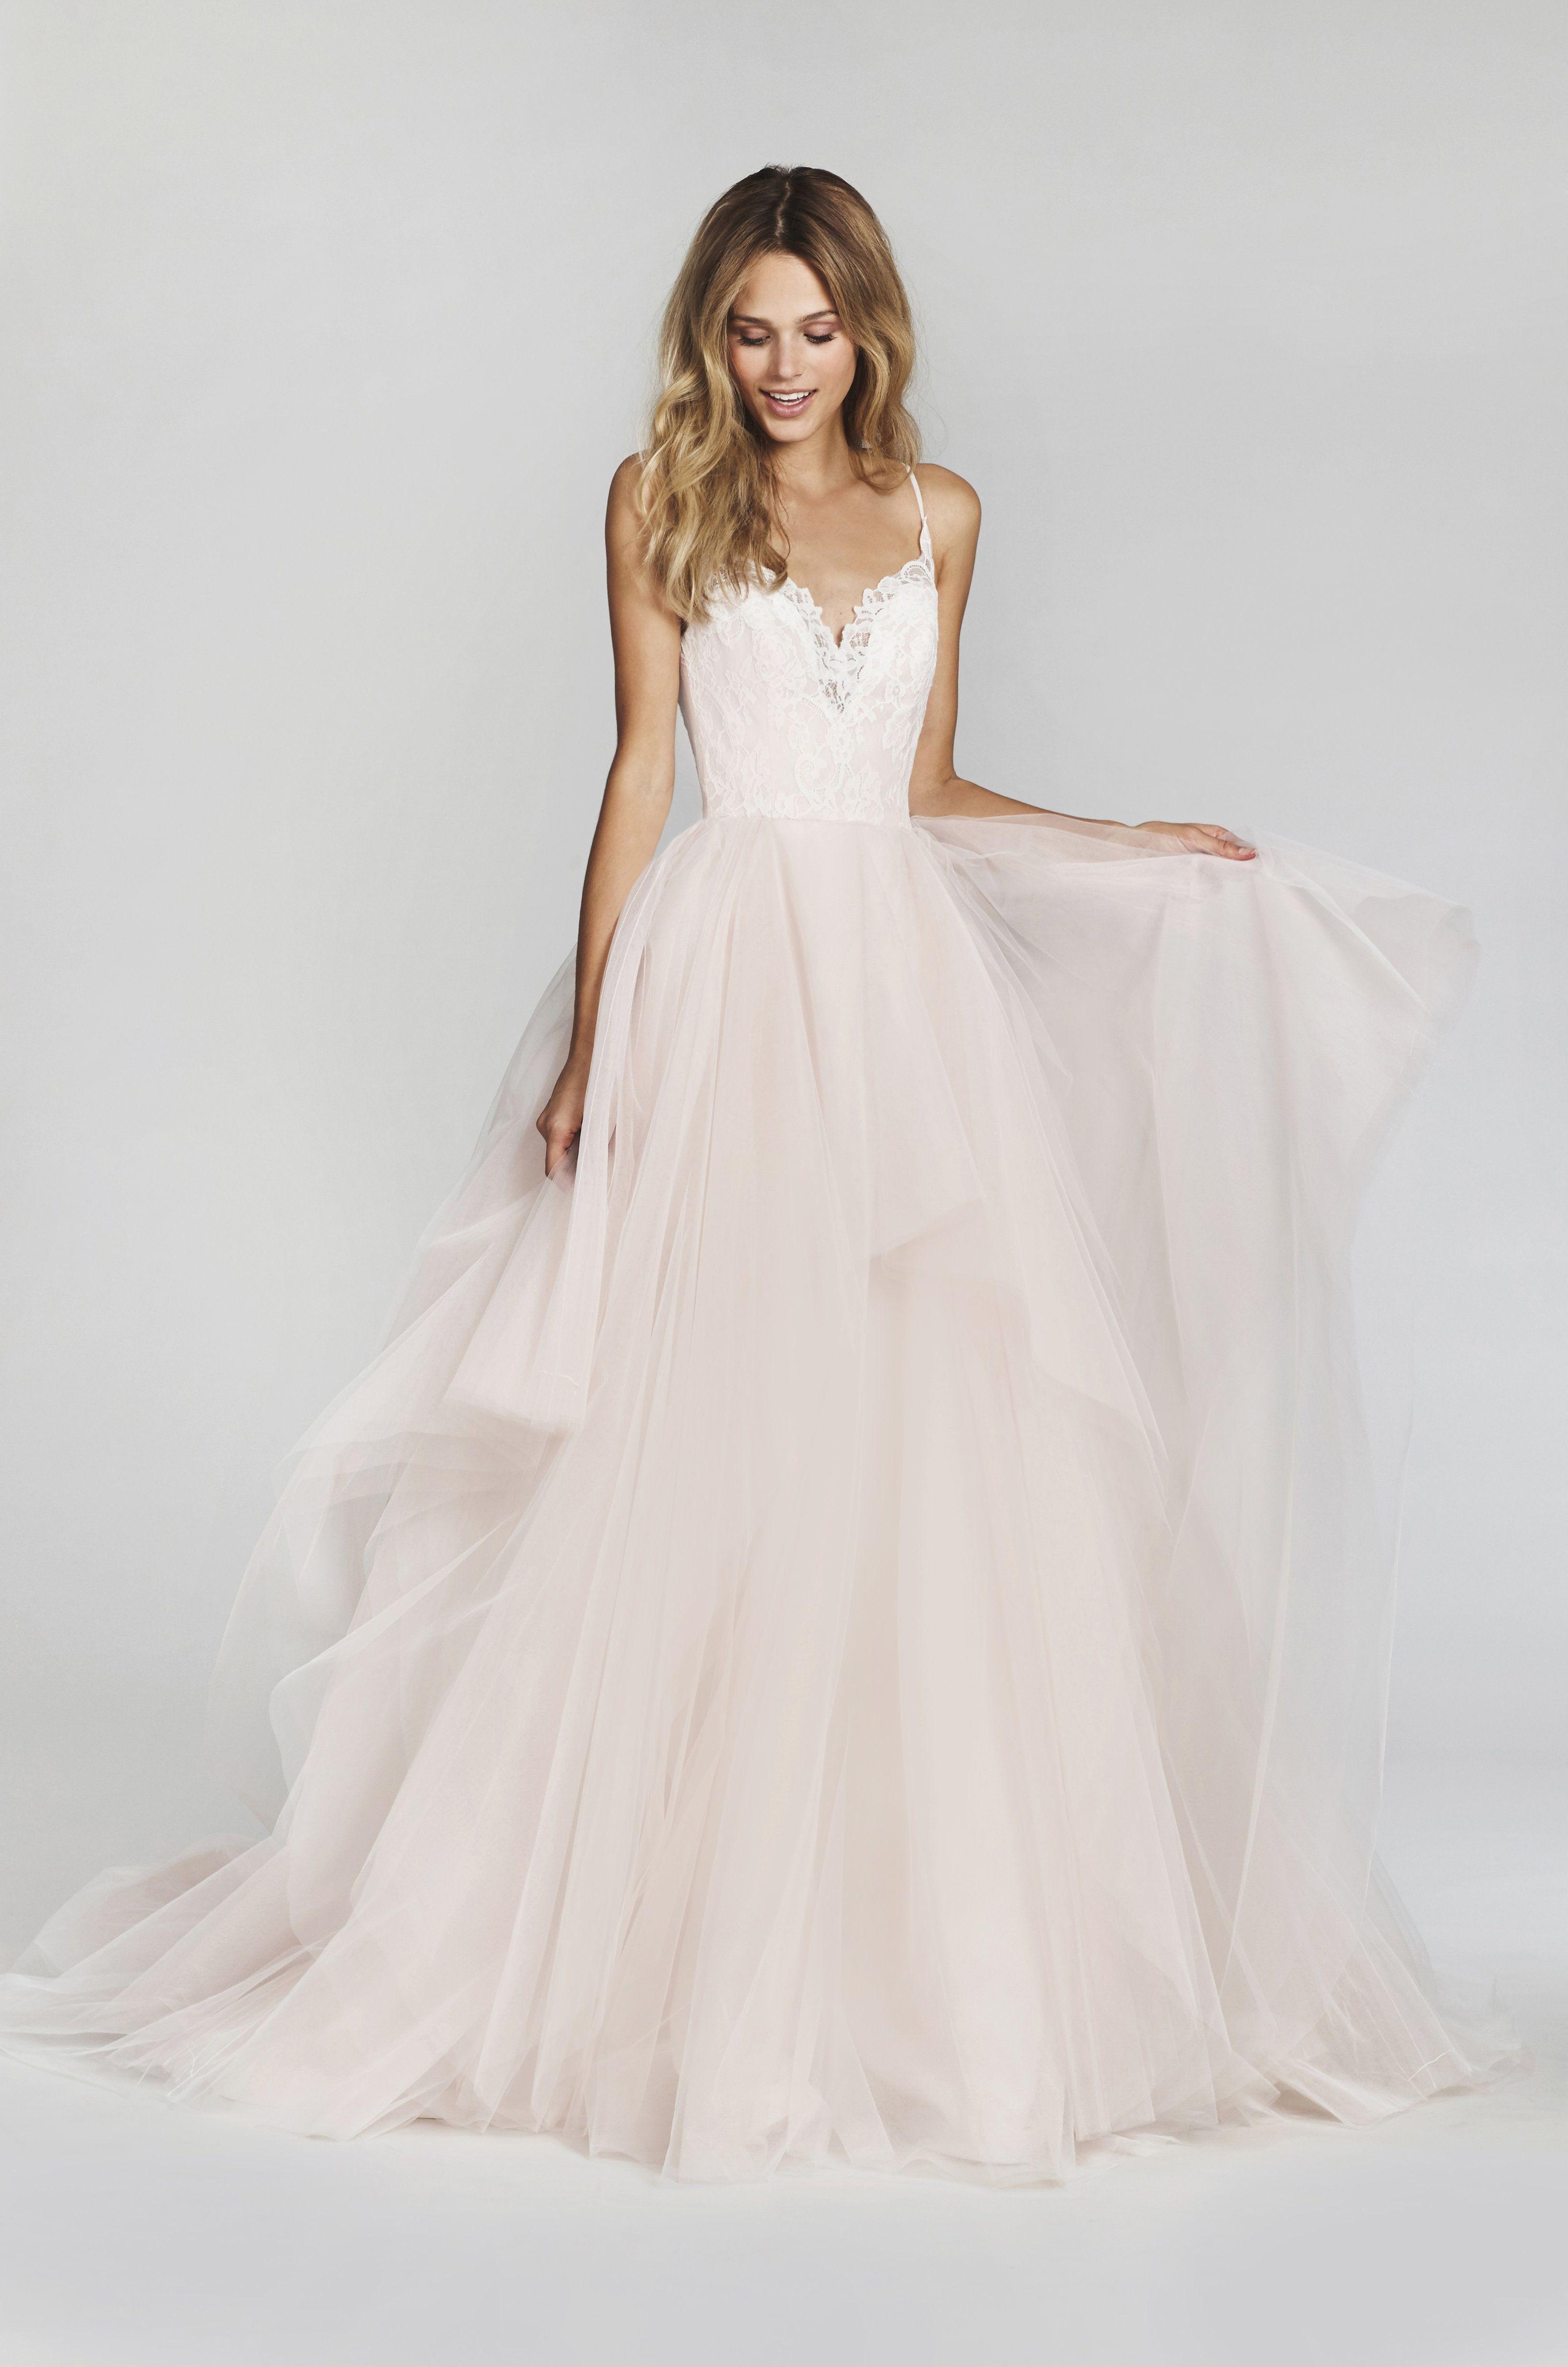 Different color wedding dresses  Style  Lilou Lookbook Front  Weddings  Pinterest  Wedding